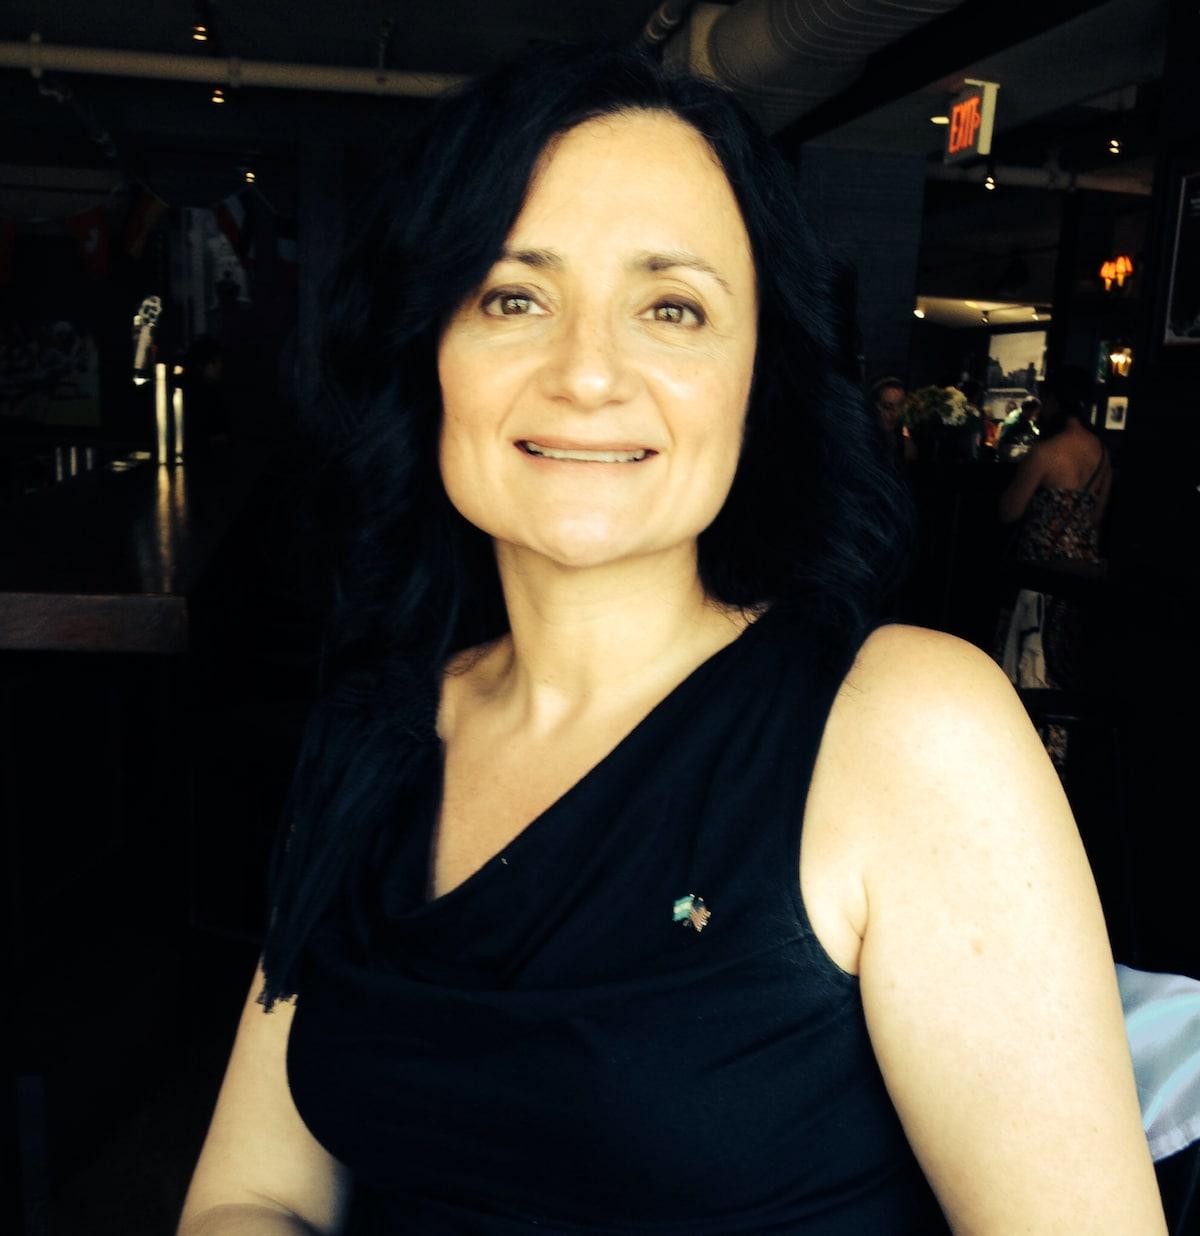 Susana from Framingham